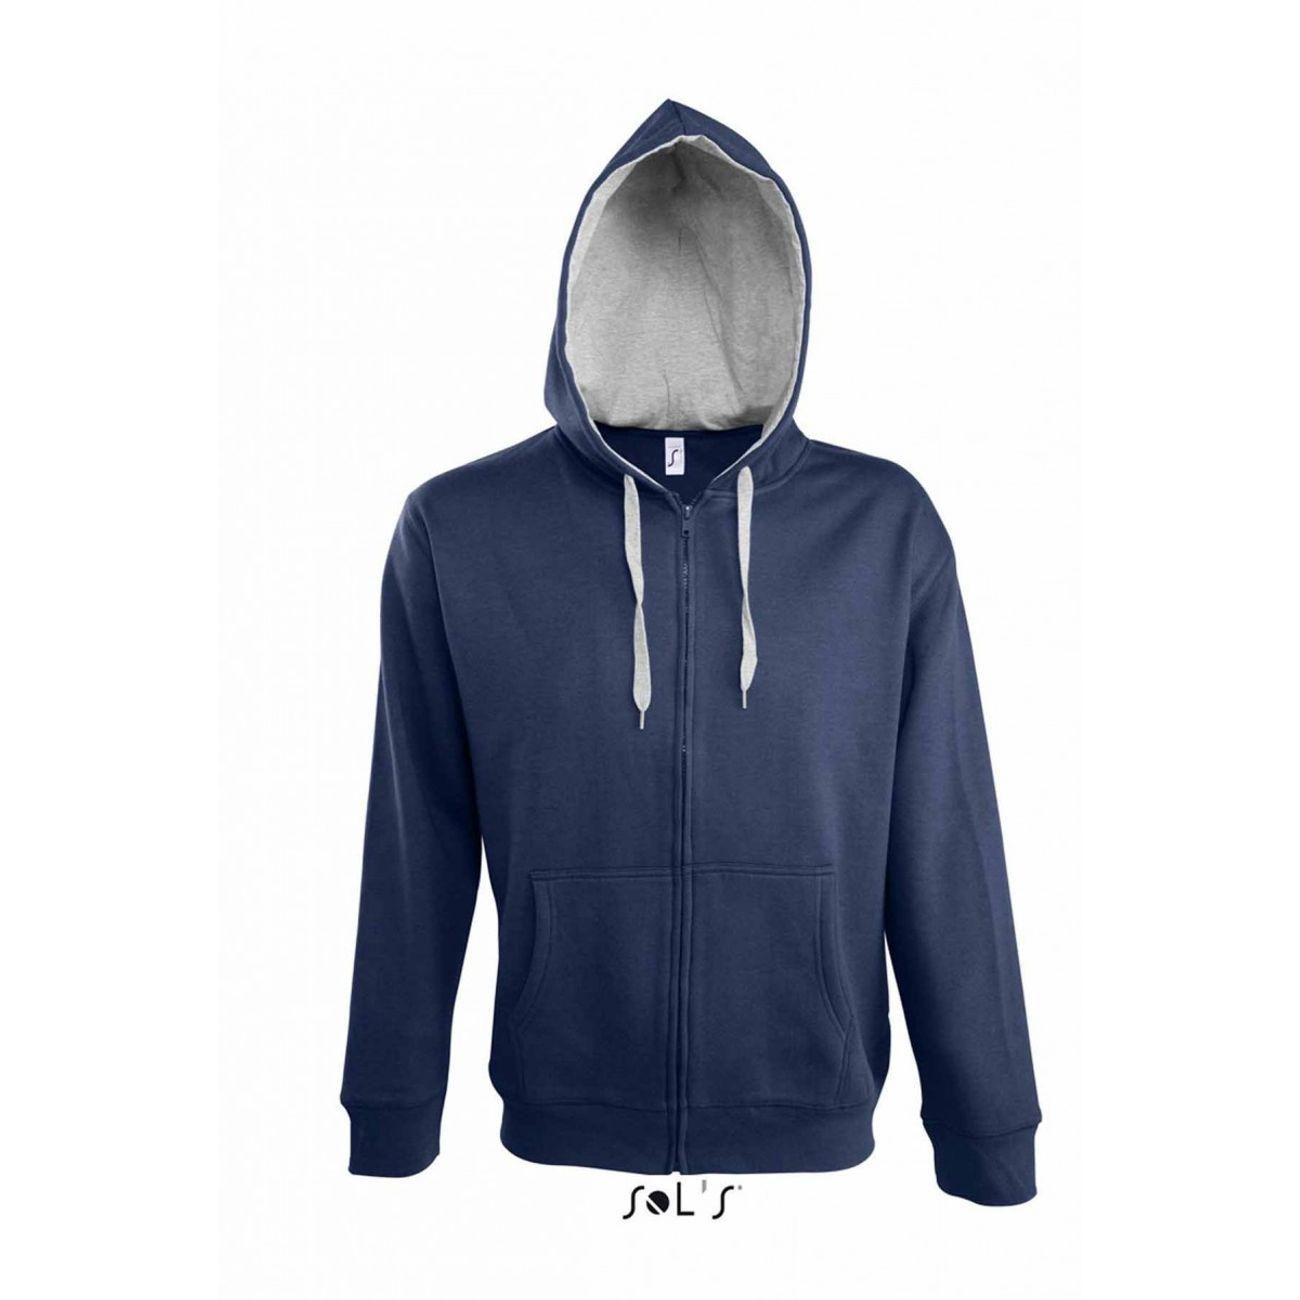 0d059ea5f1e veste-zippee-homme-bicolore-a-capuche-contrastee-et-doublee-46900---bleu -marine 1 v1.jpeg